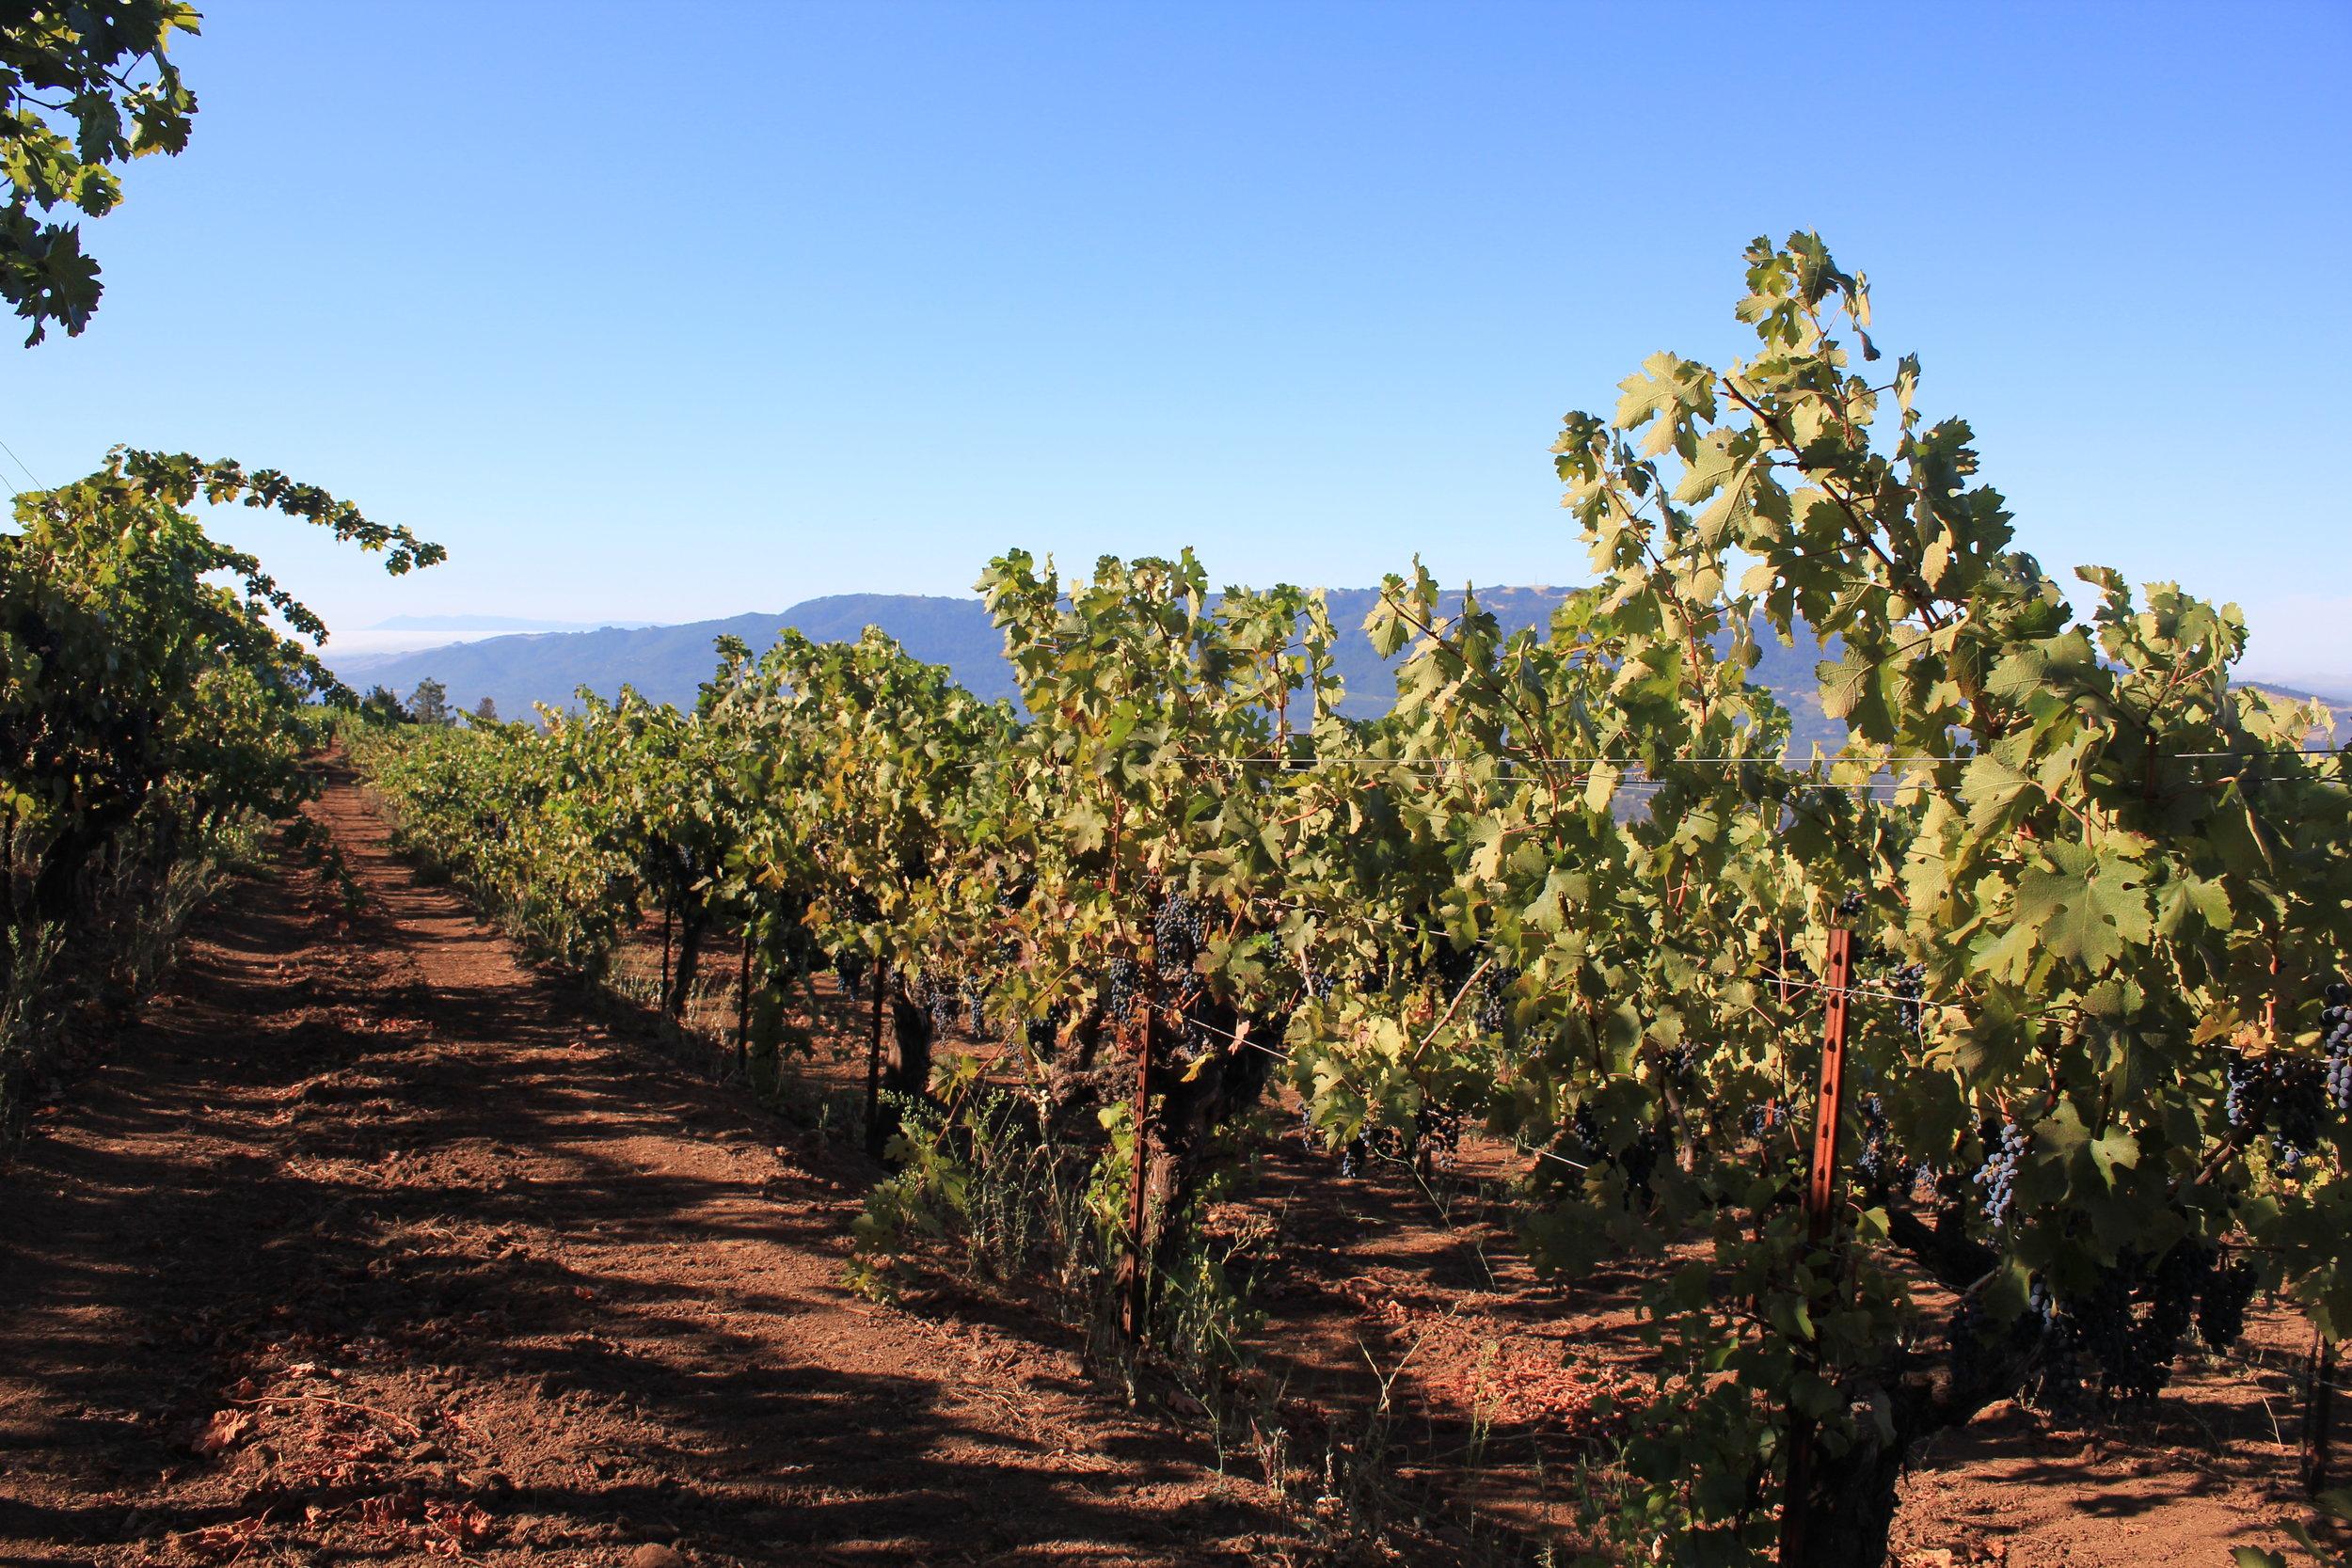 Looking south towards Sonoma Mountain